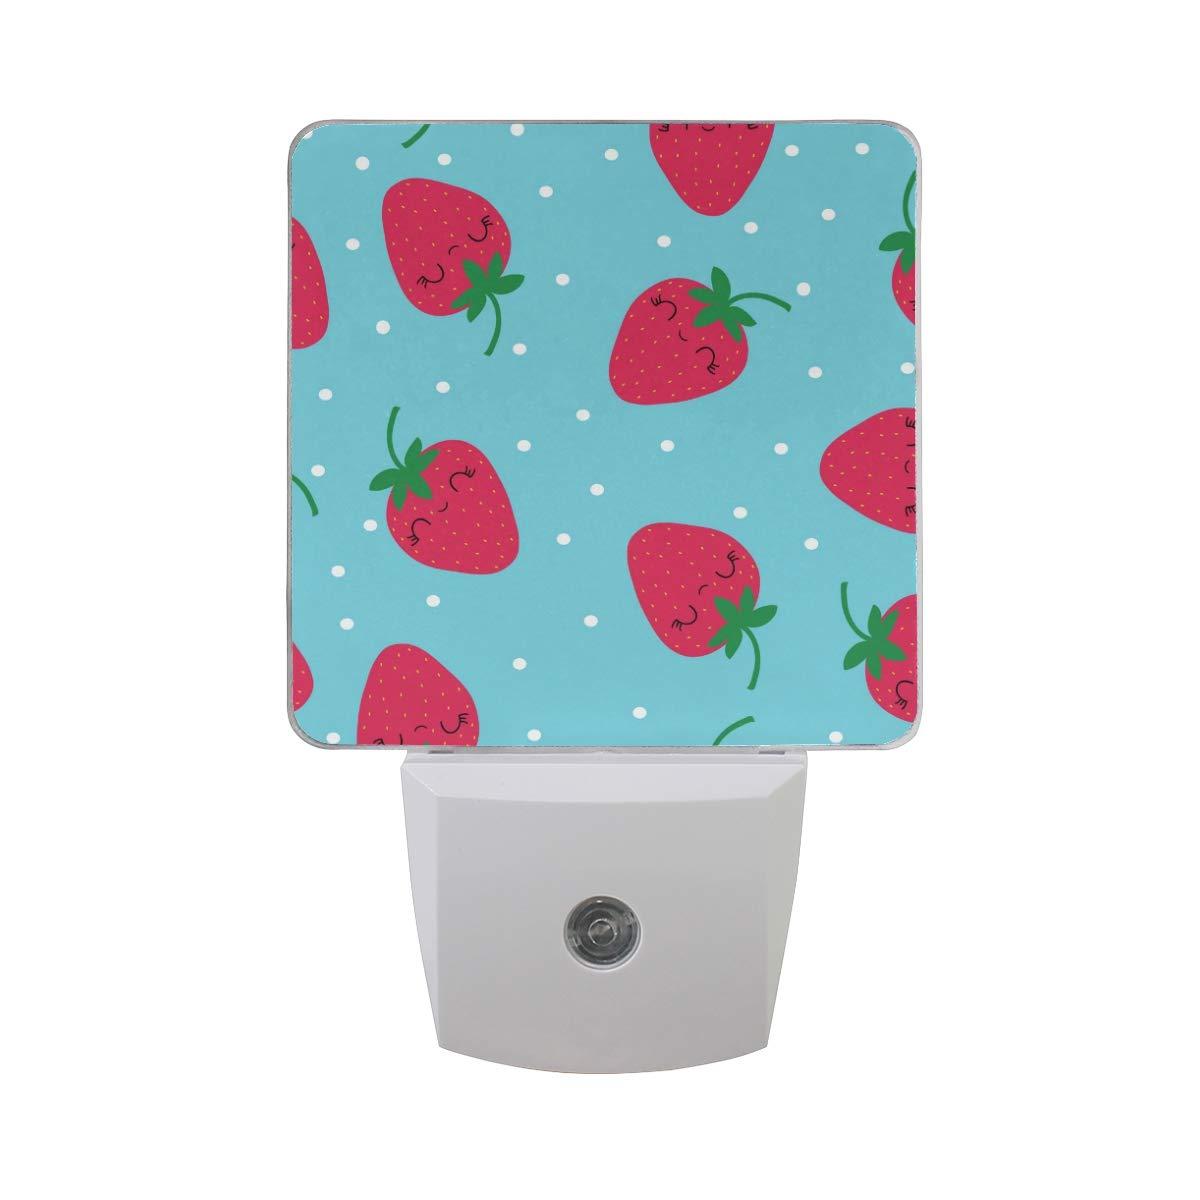 Linomo LED Night Light Lamp Red Strawberry Pattern Auto Senor Nightlight Plug in for Kids Adults Boys Girls Bedroom Decor, 2 Pack